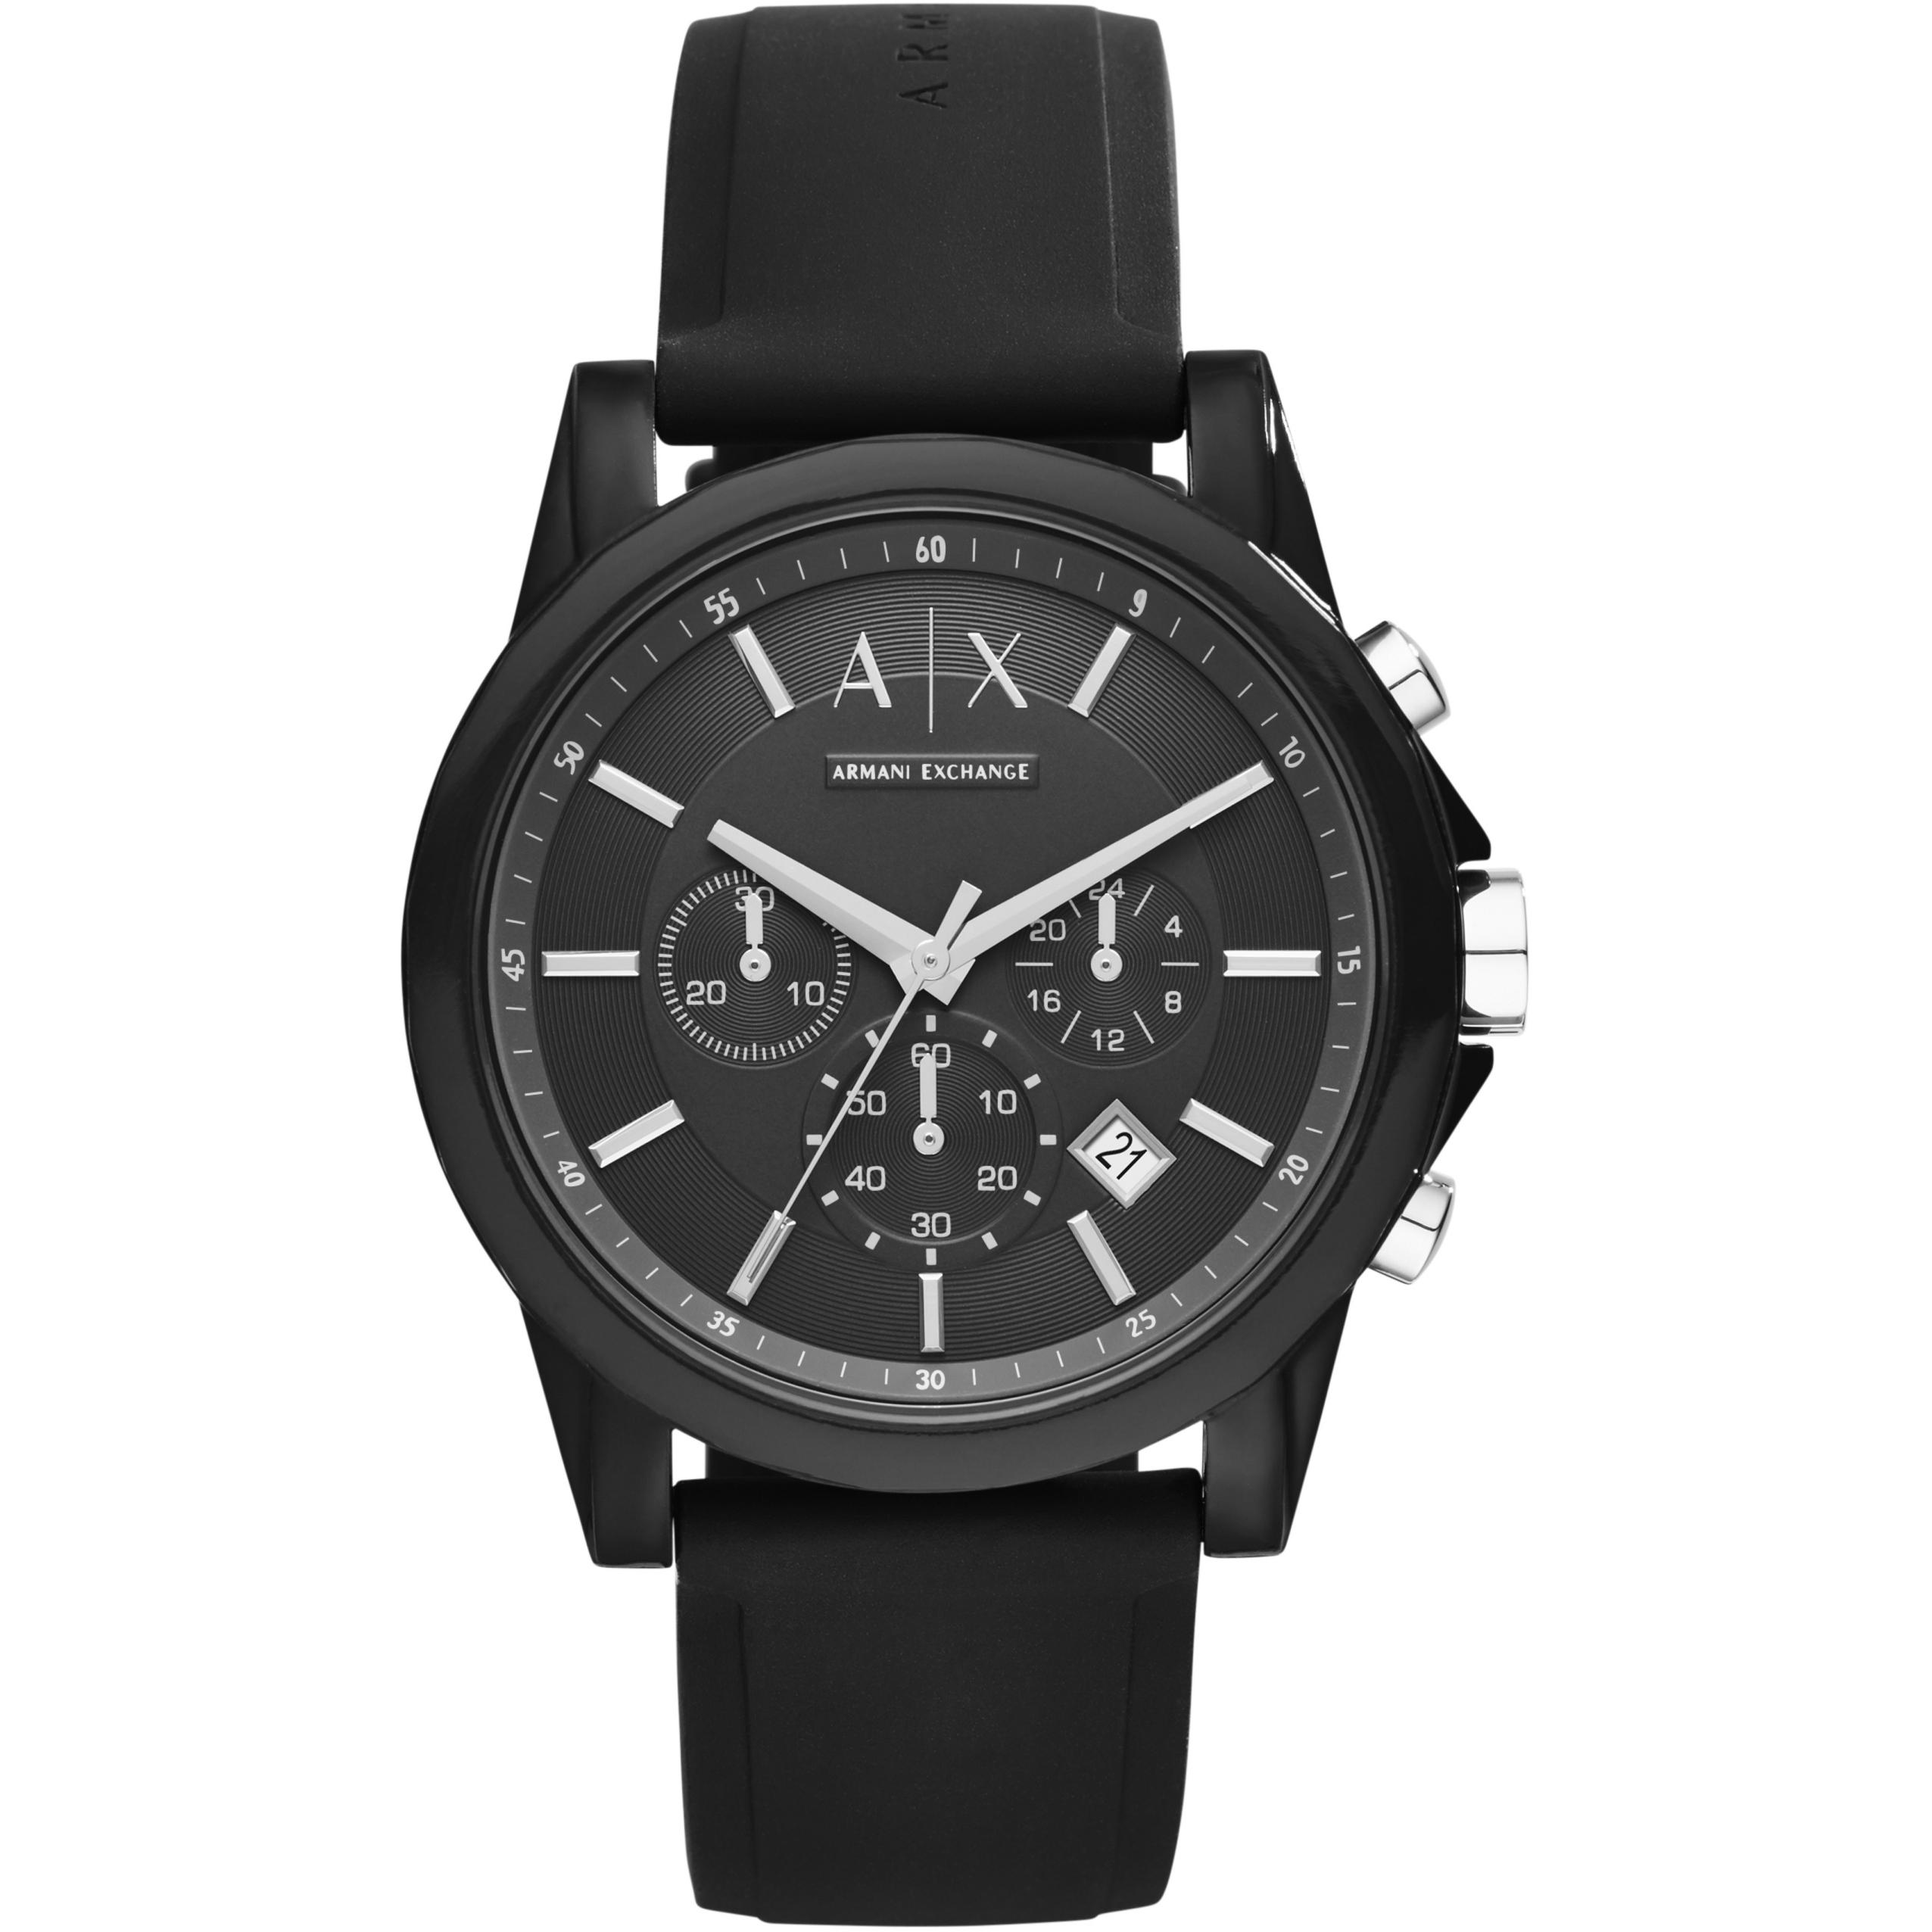 d01cda339 Gents Armani Exchange Chronograph Watch (AX1326) | WatchShop.com™